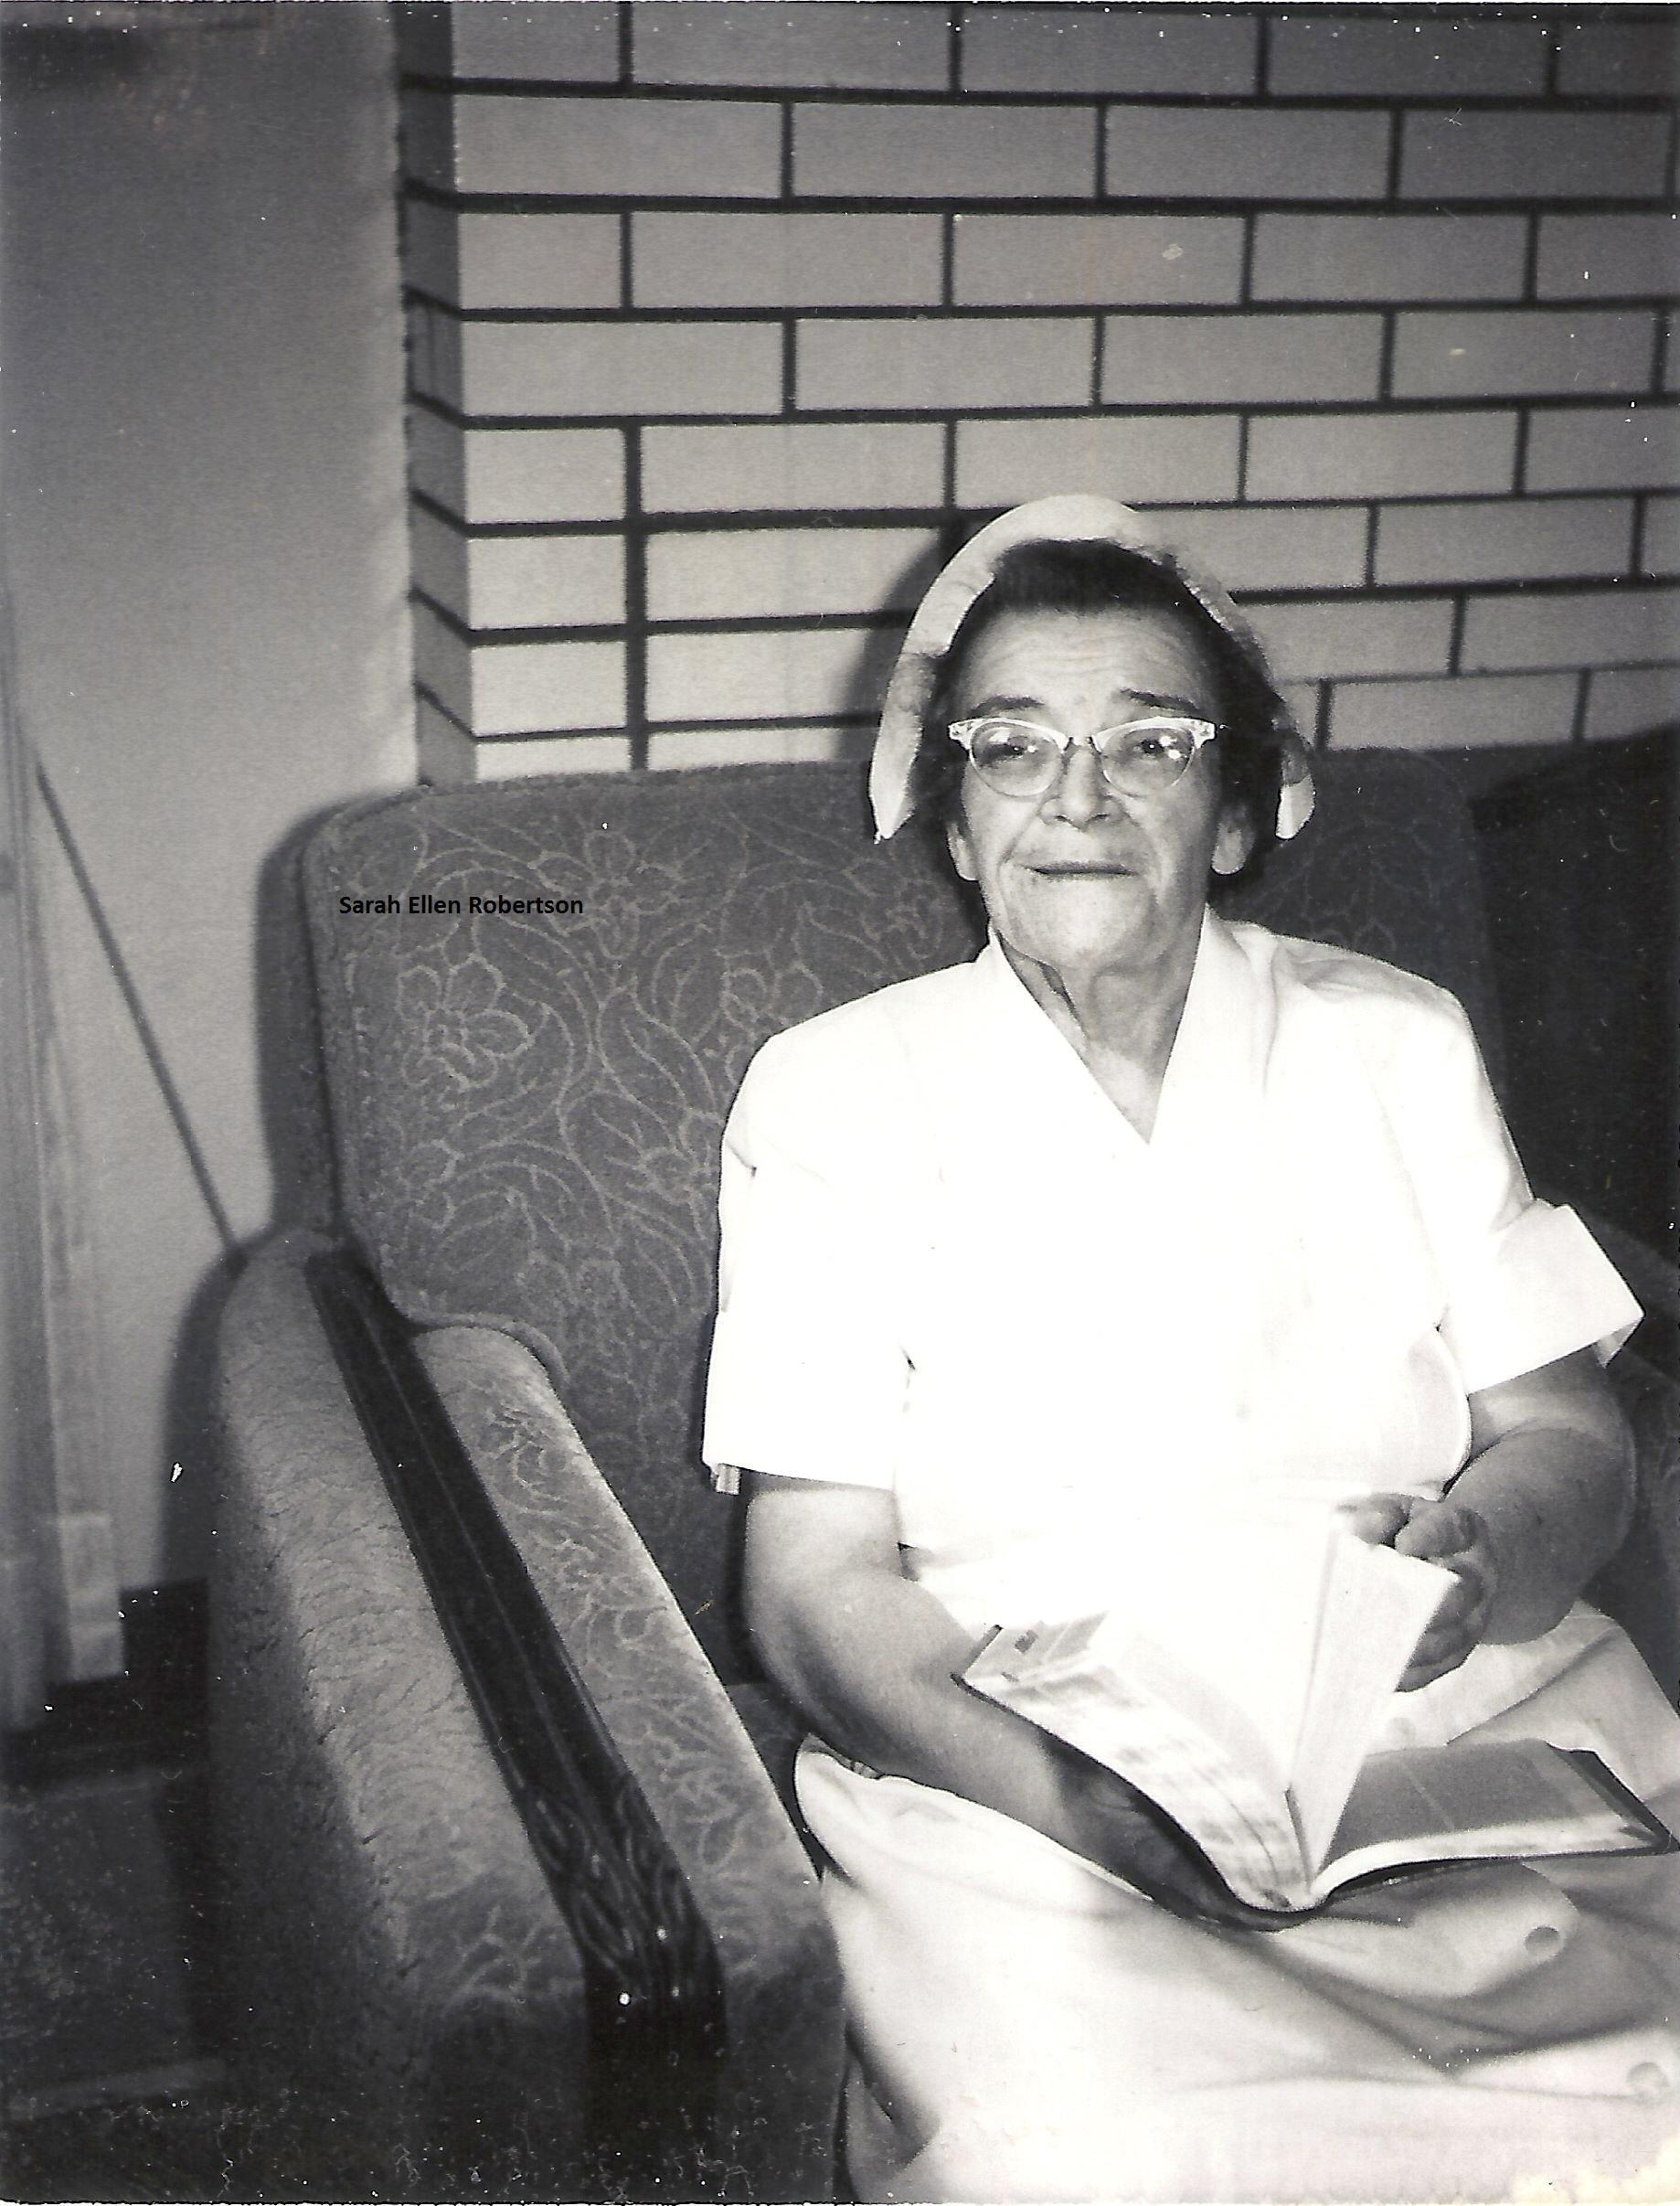 Sarah Ellen Robertson